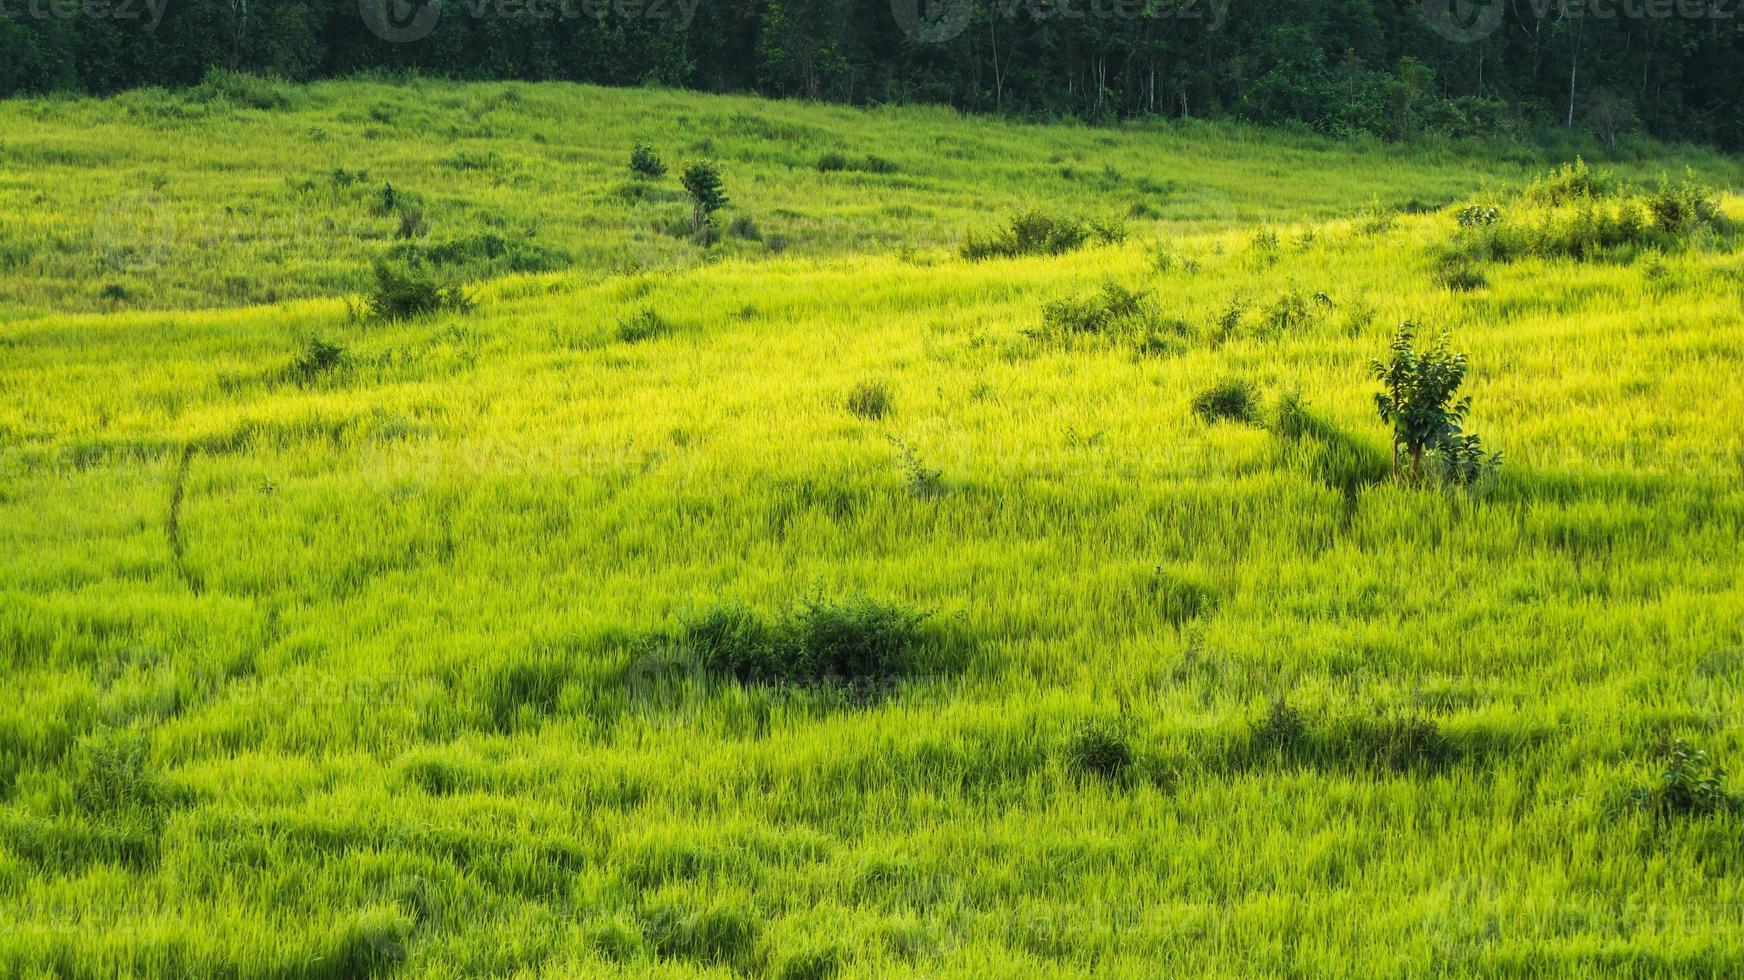 Prairie verte, parc national de Khao Yai Thaïlande photo